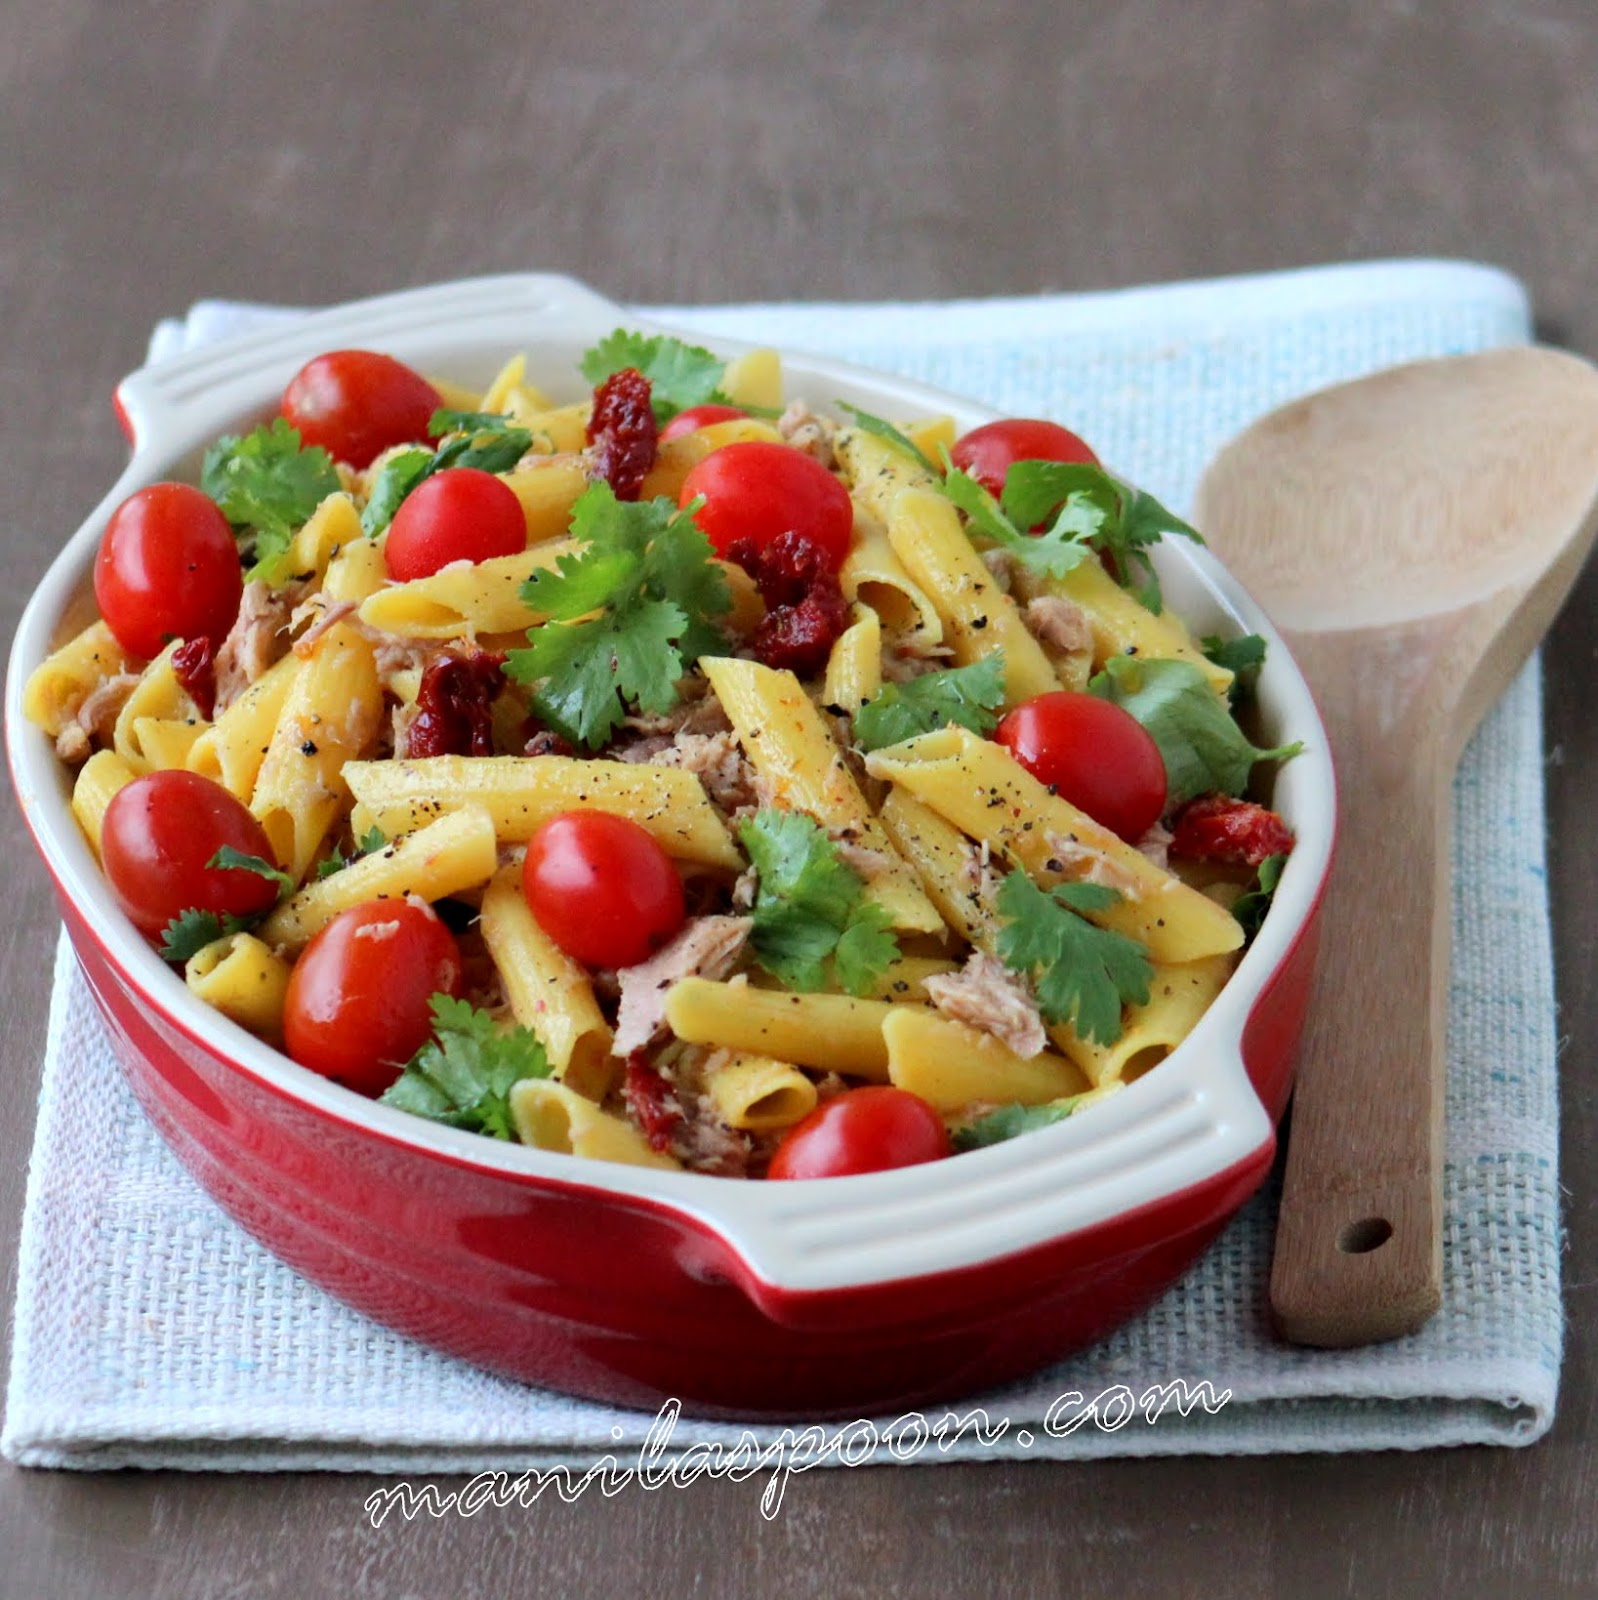 Easy Gluten-free Tuna Pasta Salad